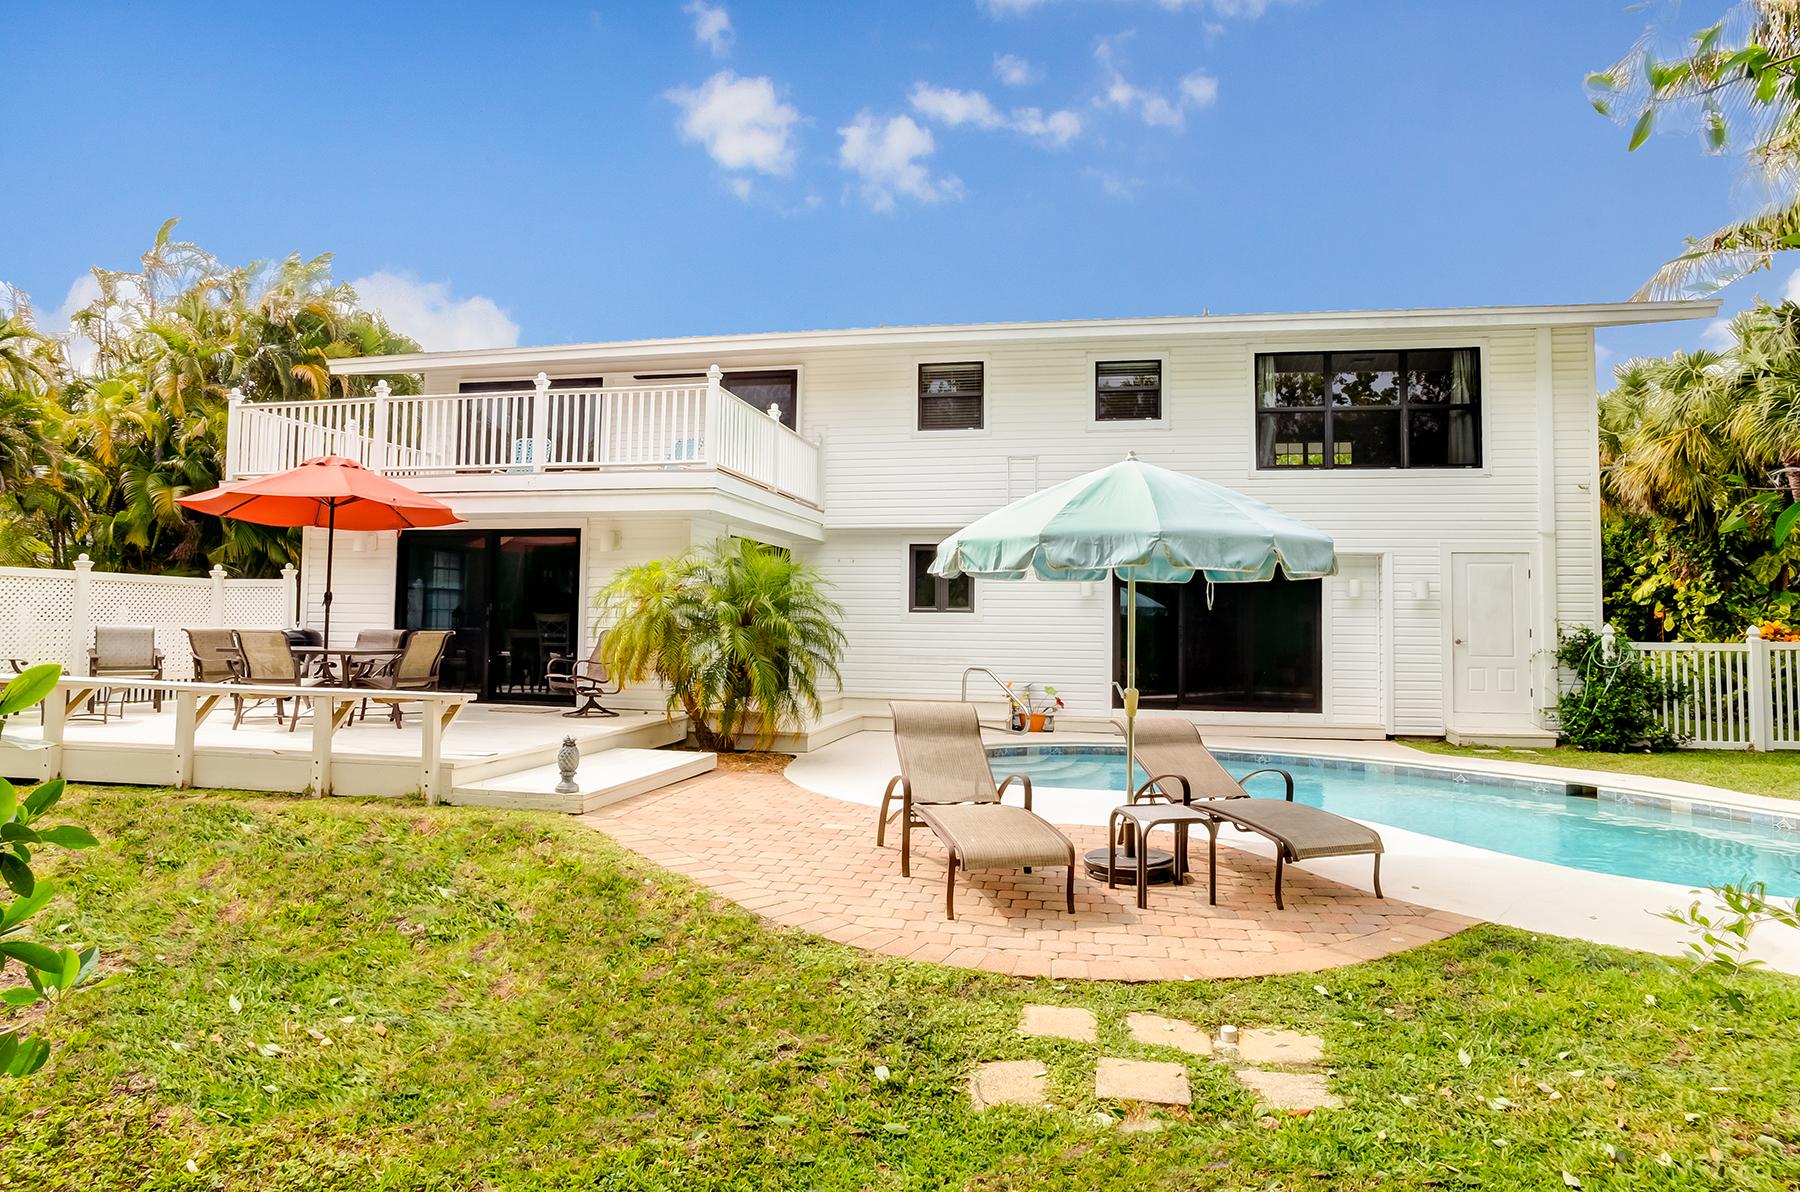 Villa per Vendita alle ore SANIBEL 931 S Yachtsman Dr Sanibel, Florida, 33957 Stati Uniti